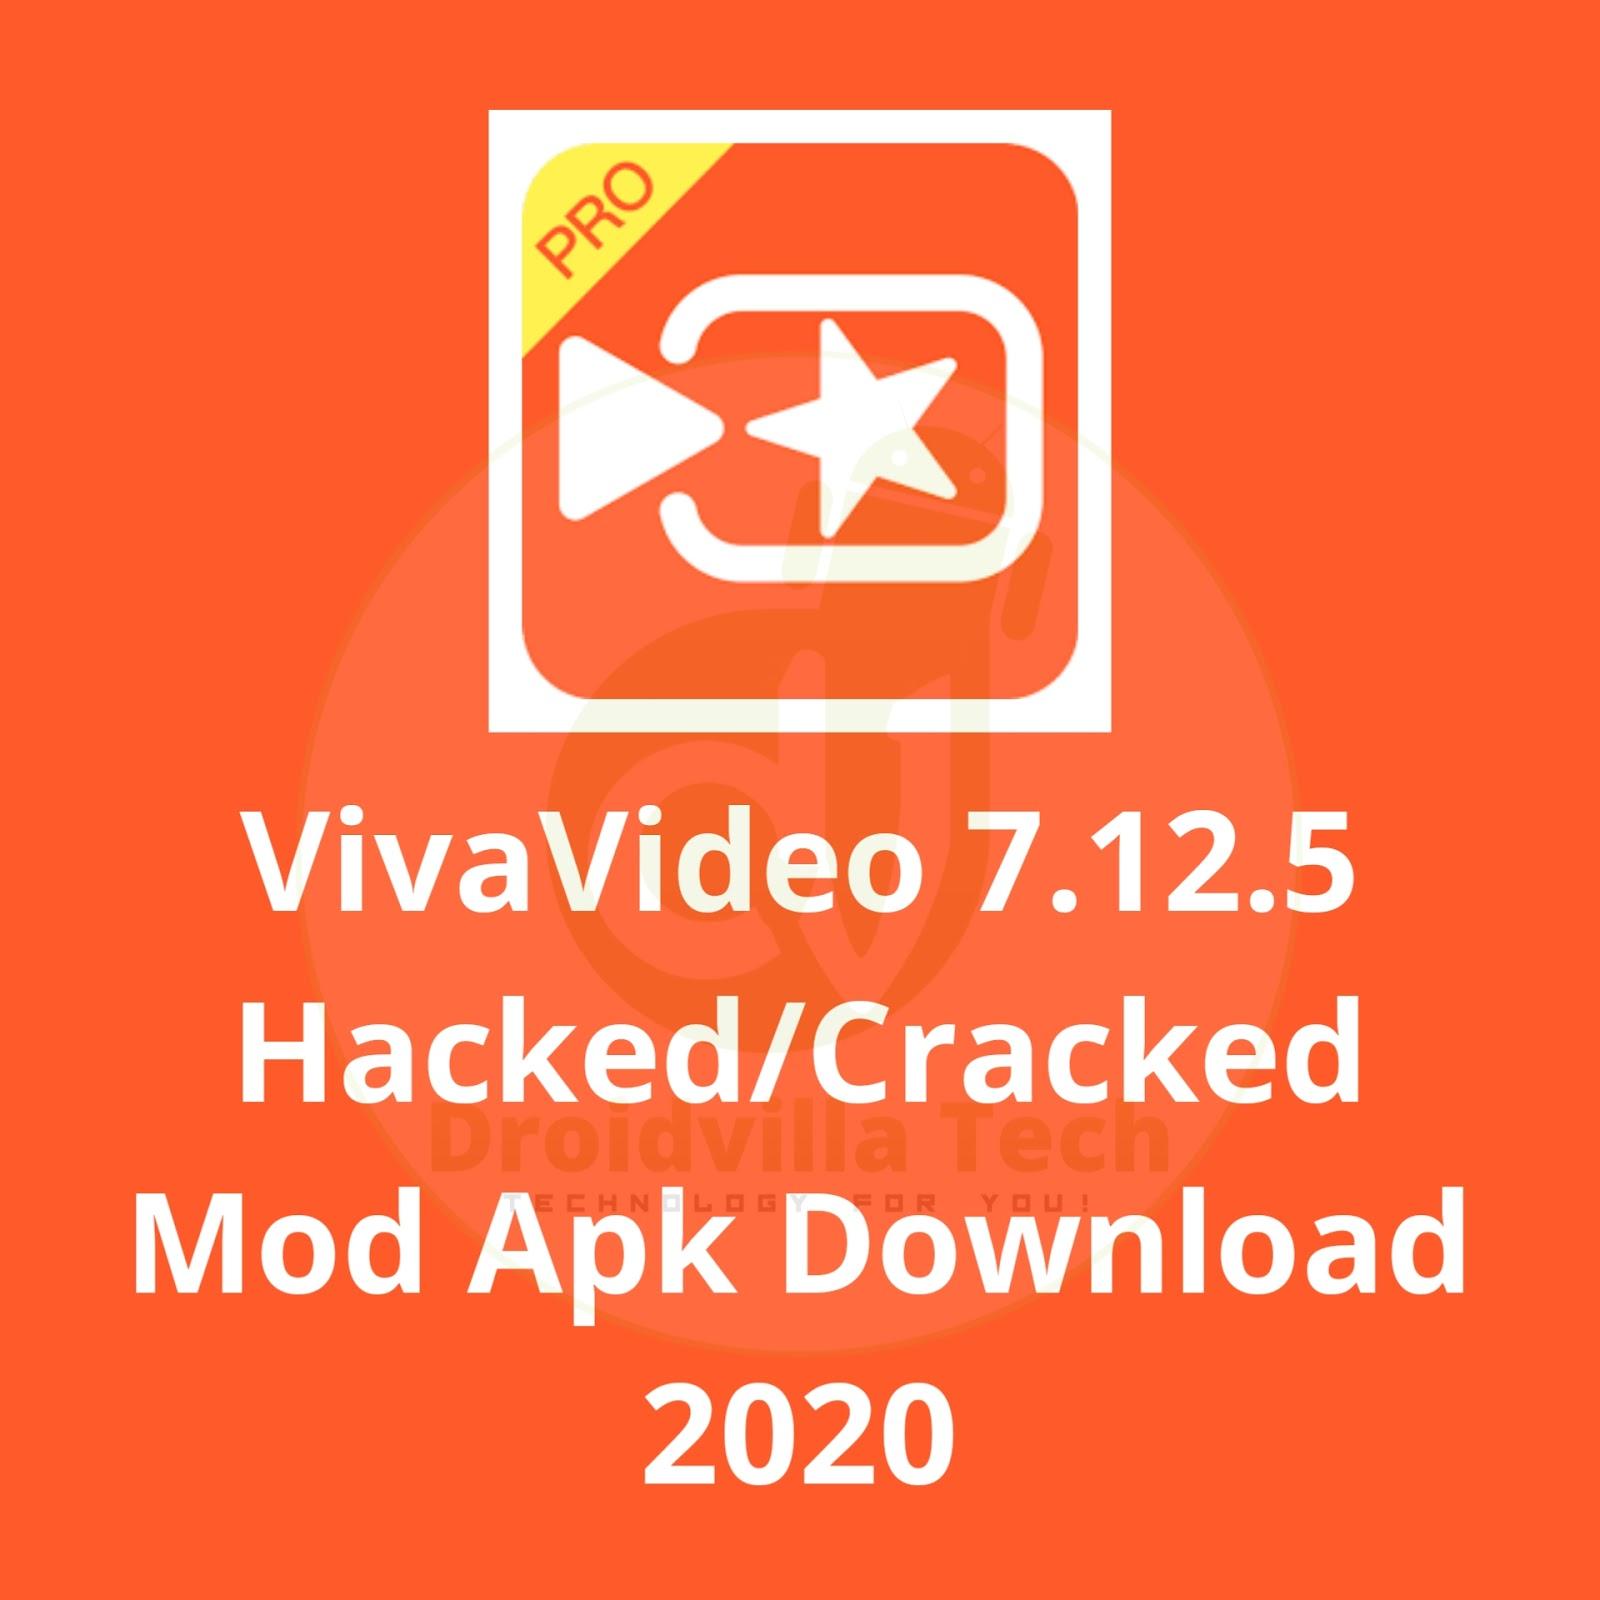 VivaVideo hacked/cracked 7.12.5